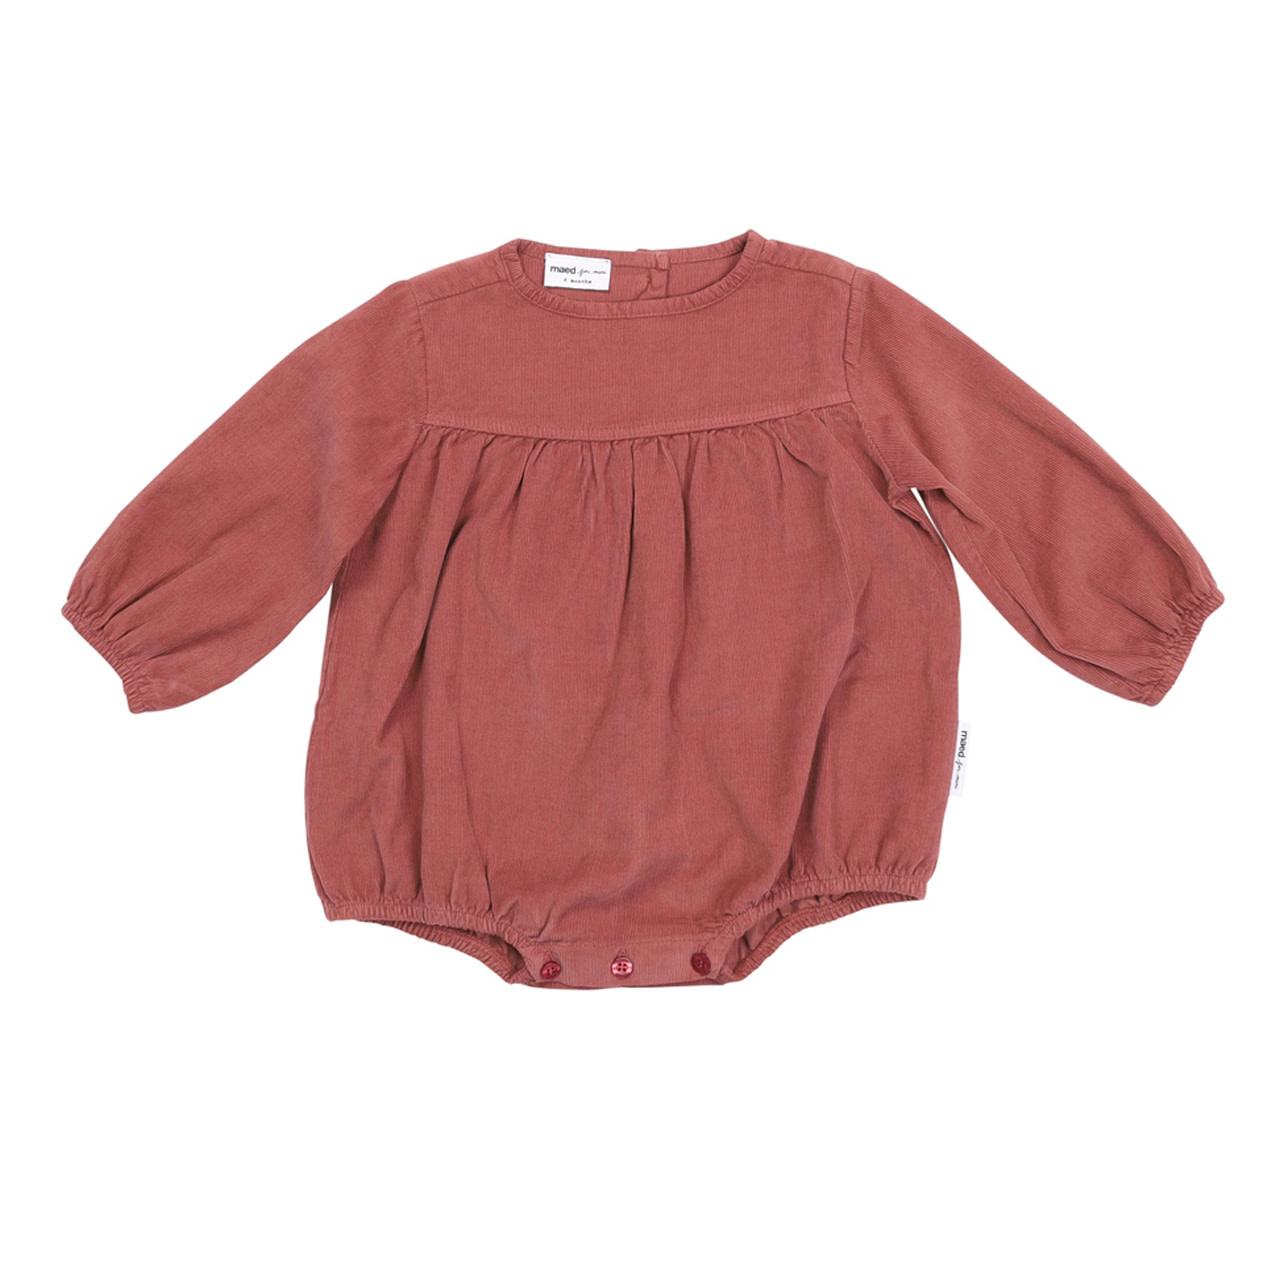 Maed For mini Maed for mini - Baby bodysuit blushing bizon